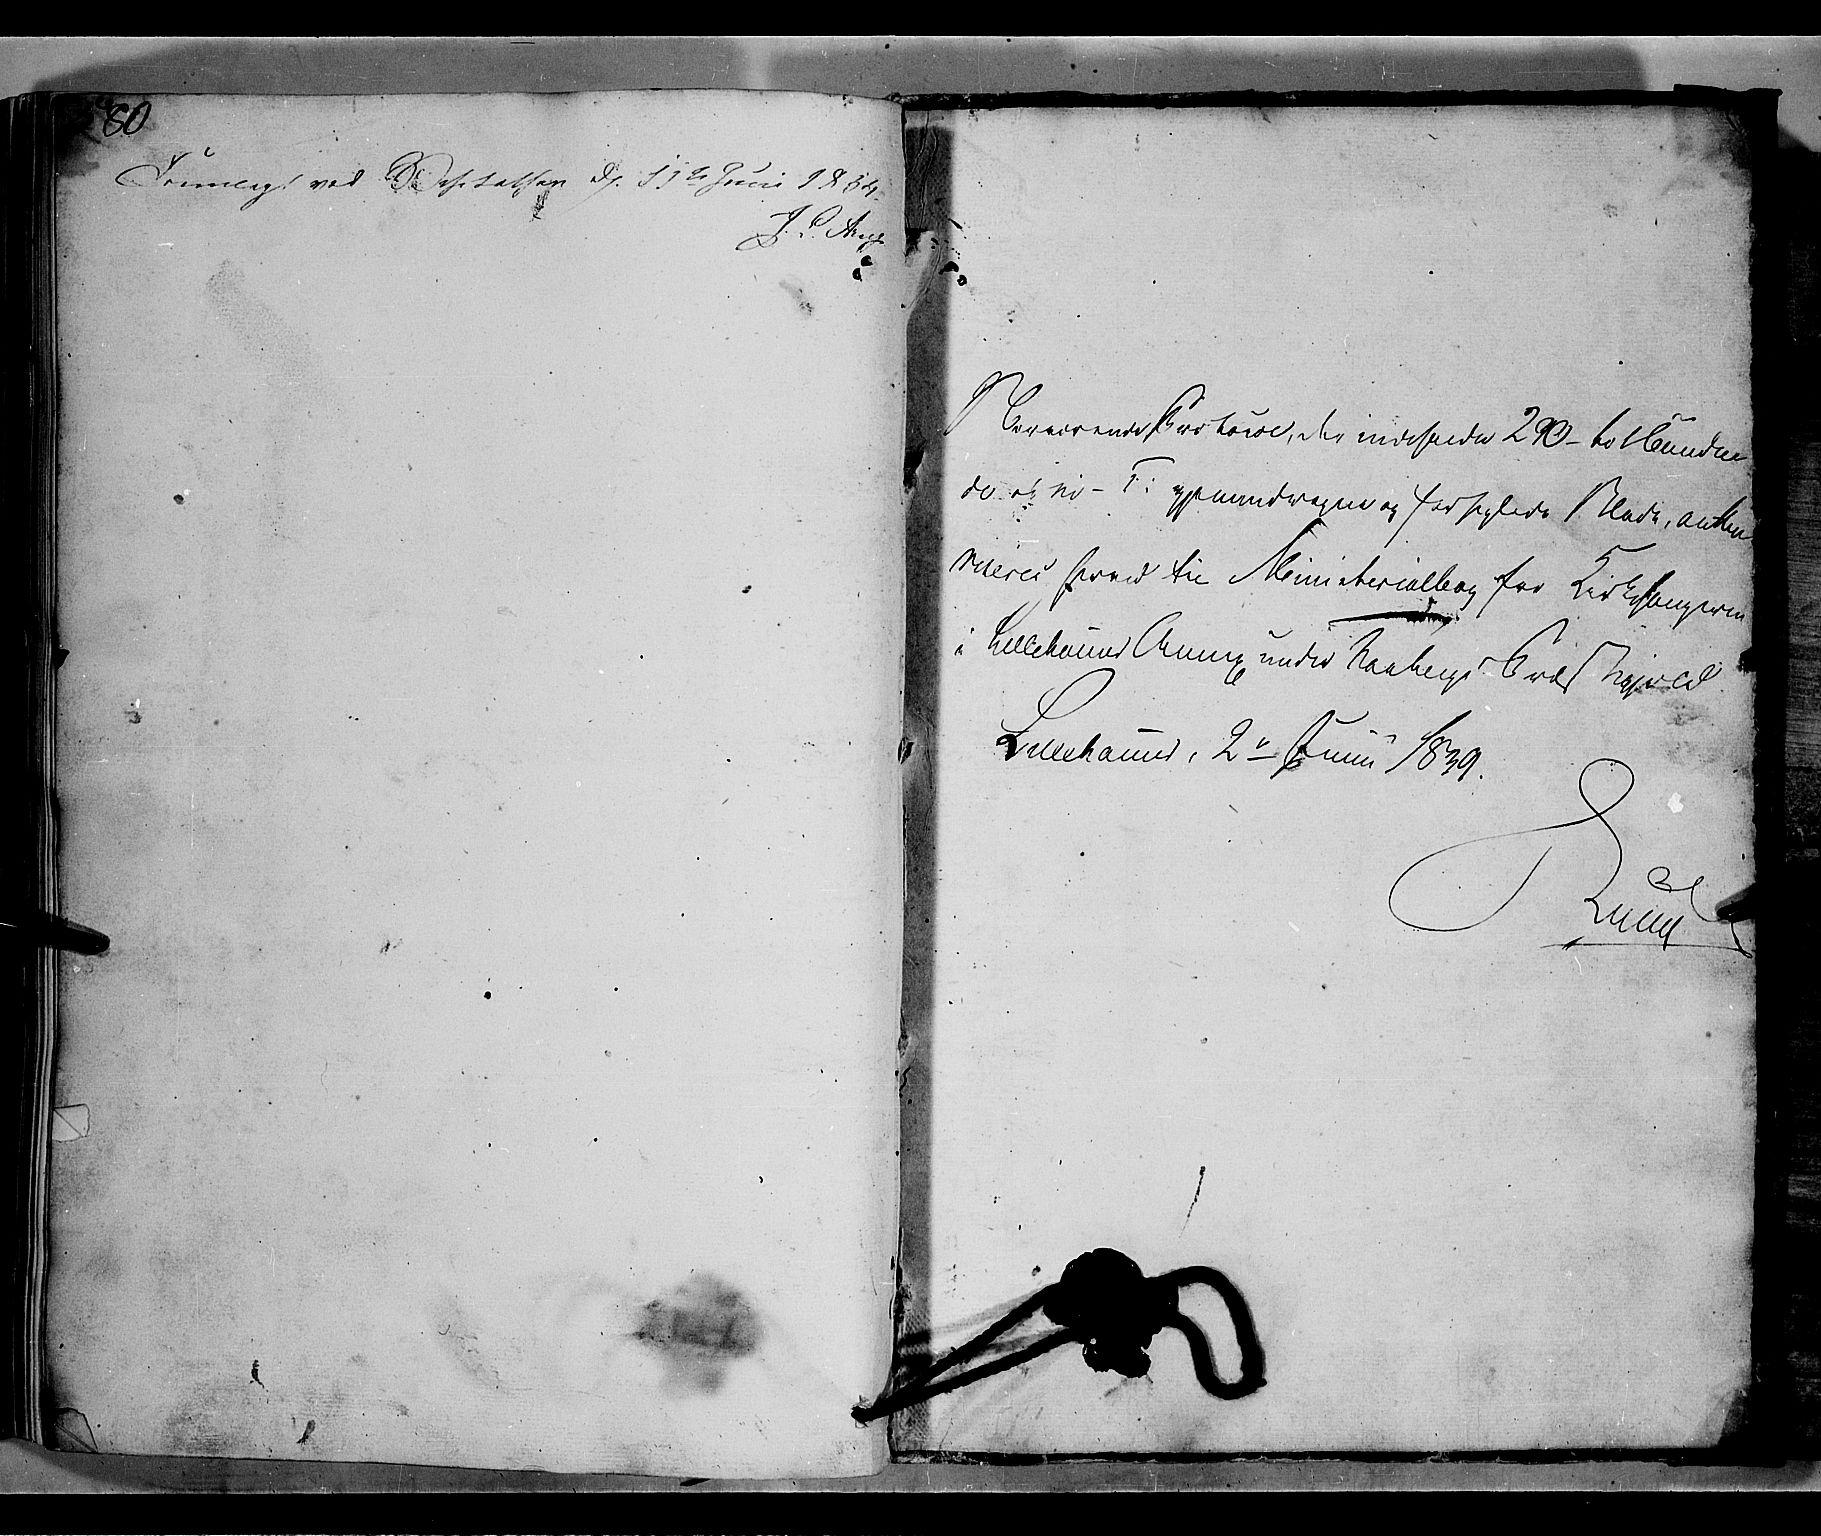 SAH, Fåberg prestekontor, H/Ha/Hab/L0006: Parish register (copy) no. 6, 1837-1855, p. 580-581